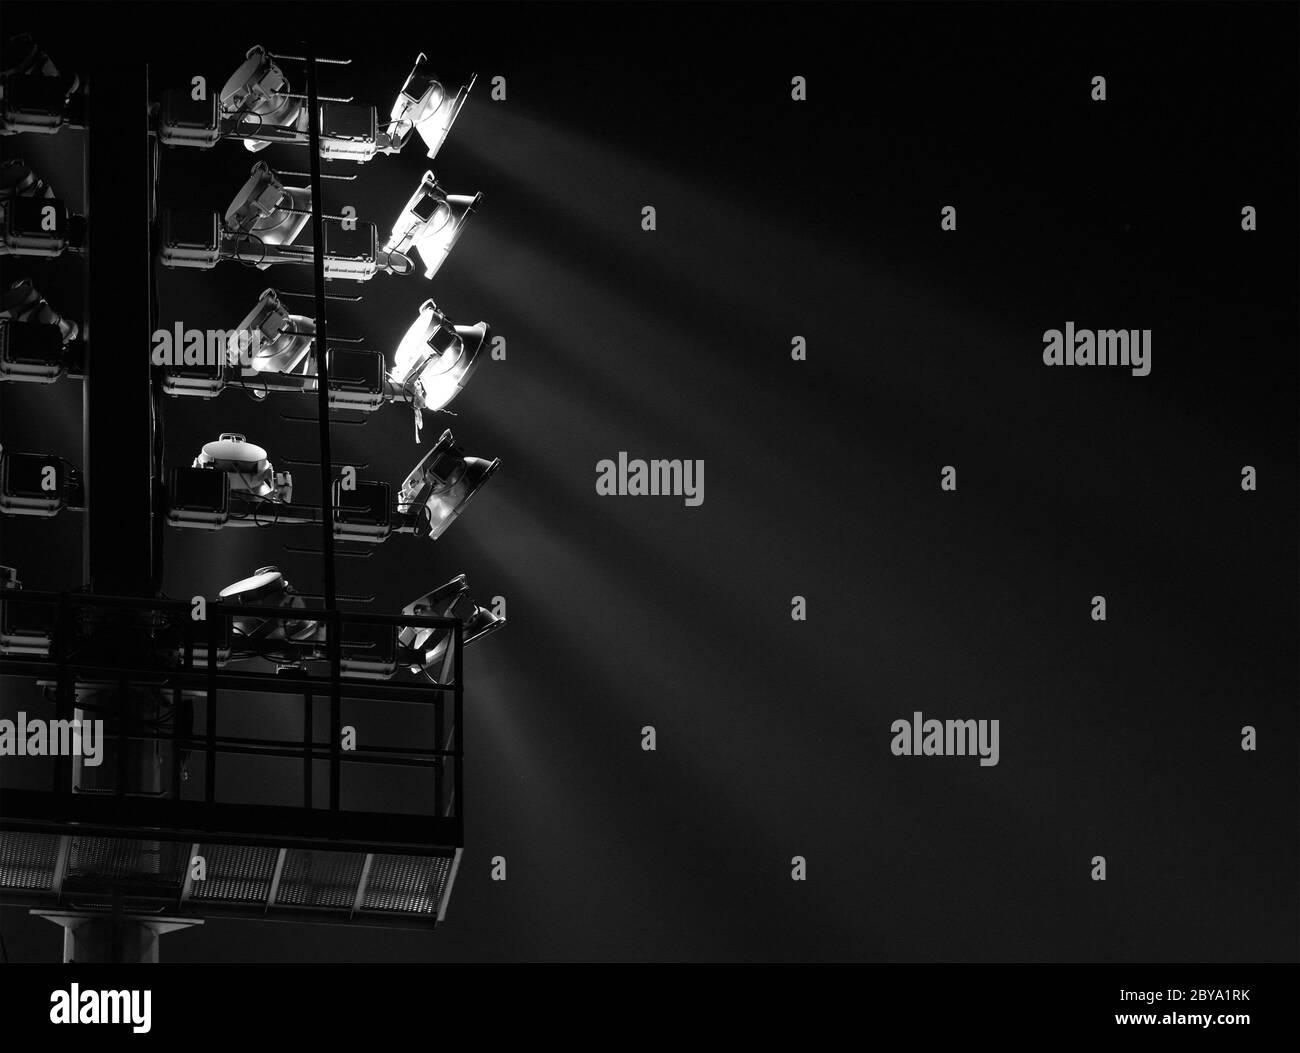 The Stadium Spot Light Tower Dark Background Stock Photo Alamy